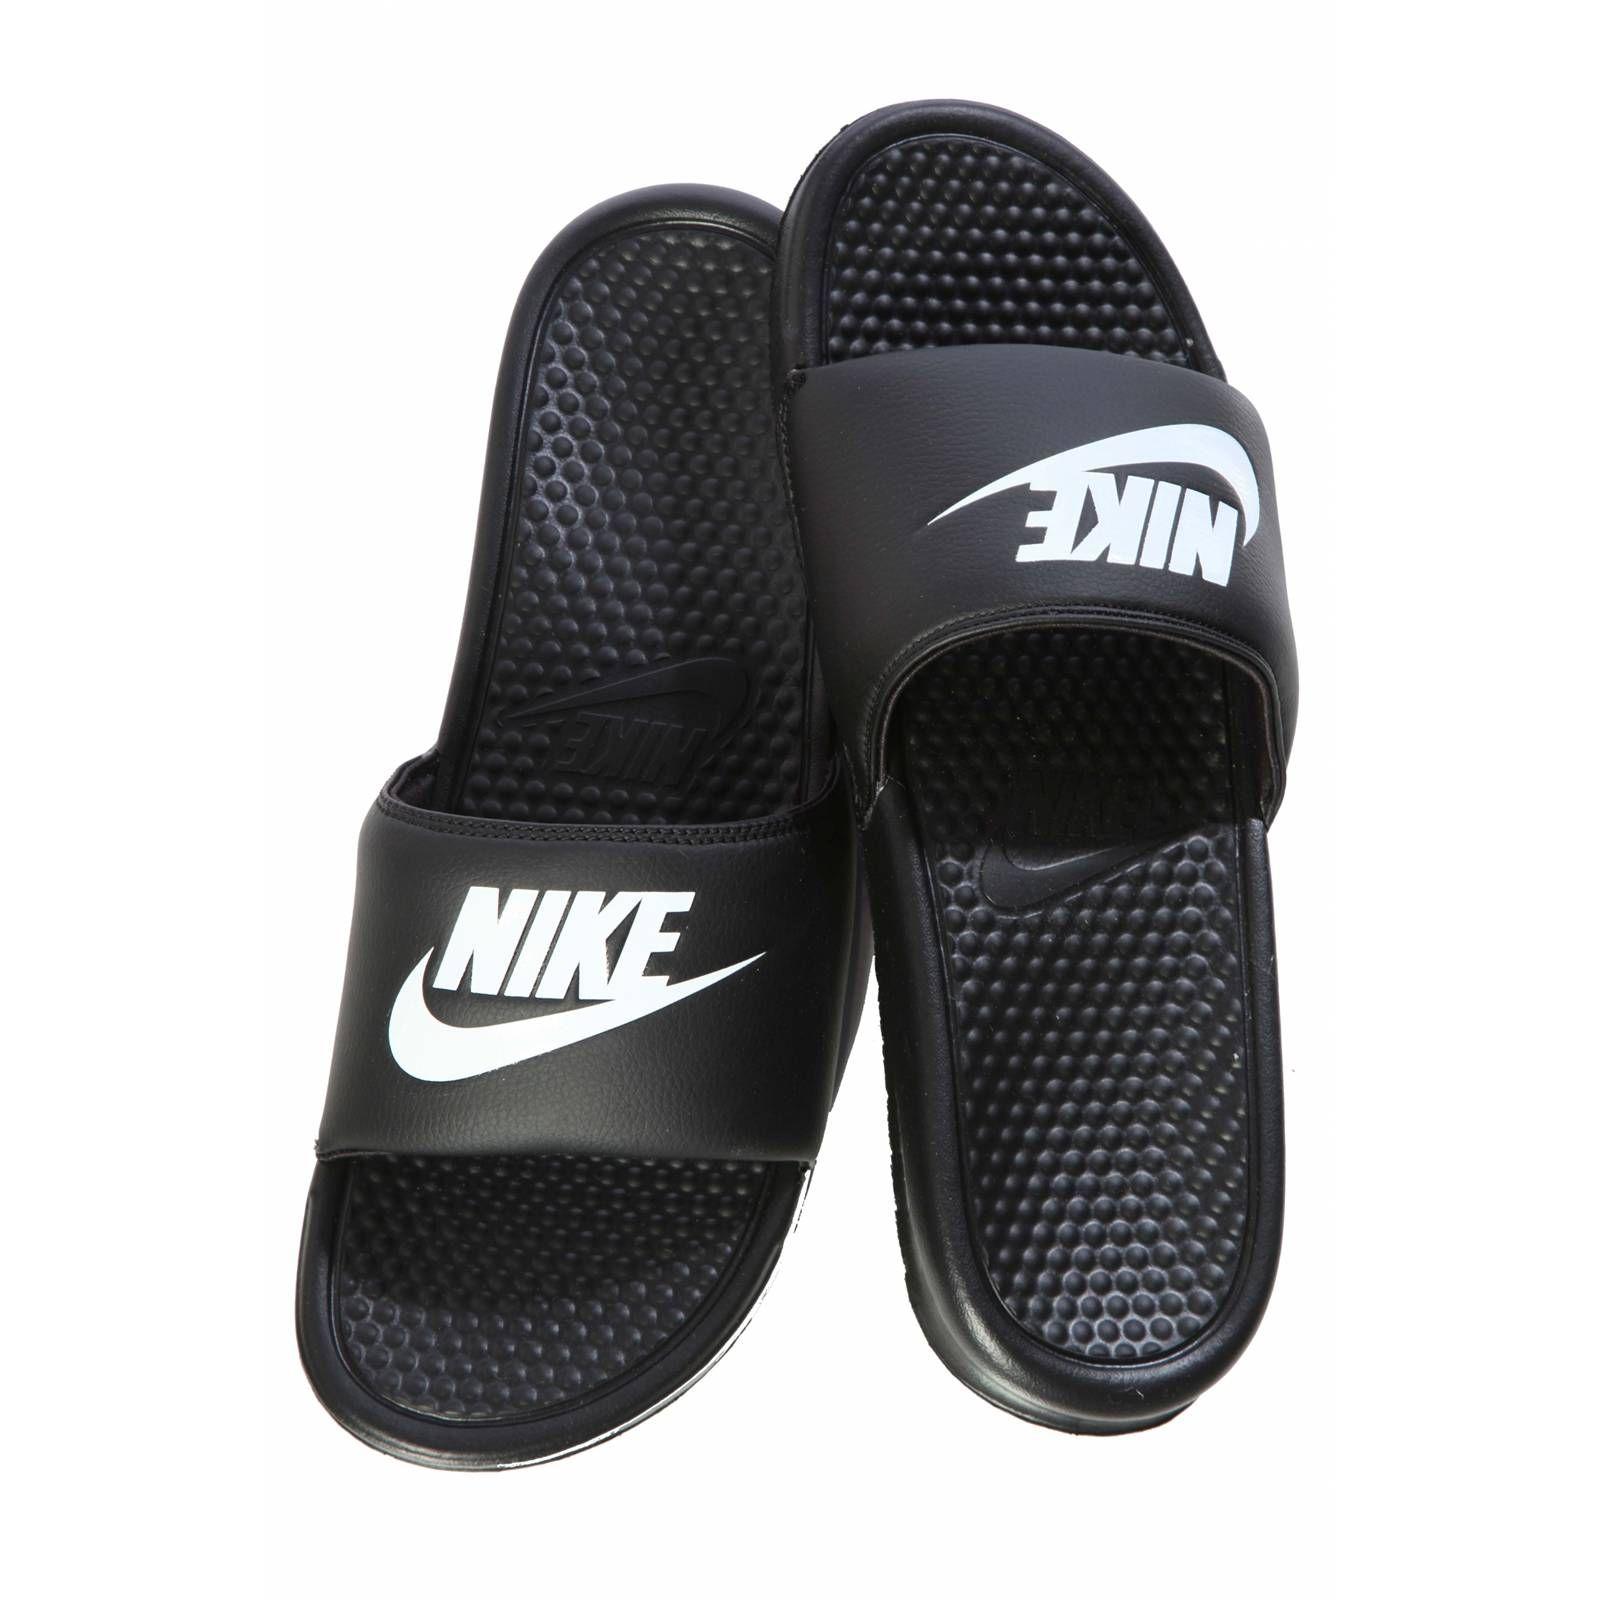 Black sandals nike - Nike Flip Flops Google Search